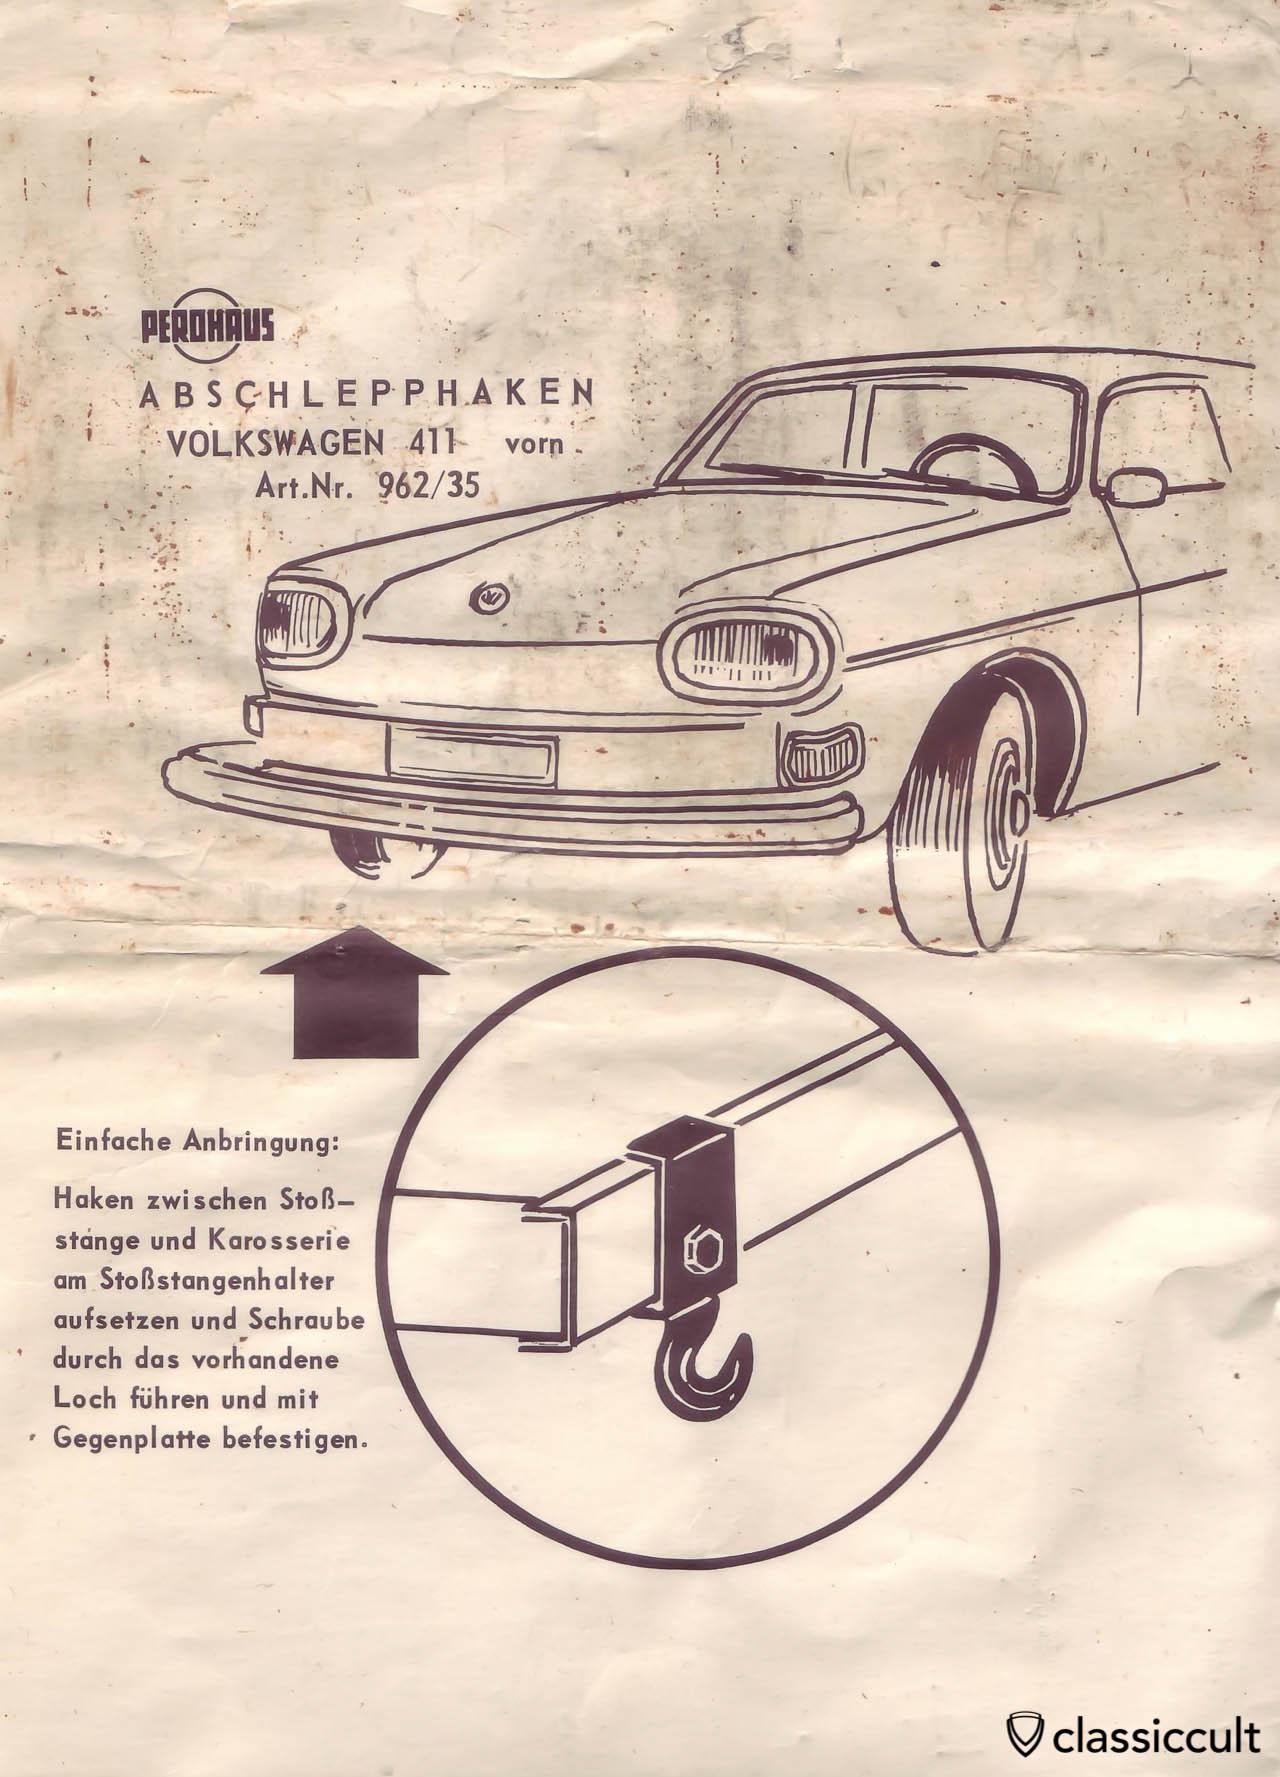 VW 411 Abschlepphaken Perohaus NOS